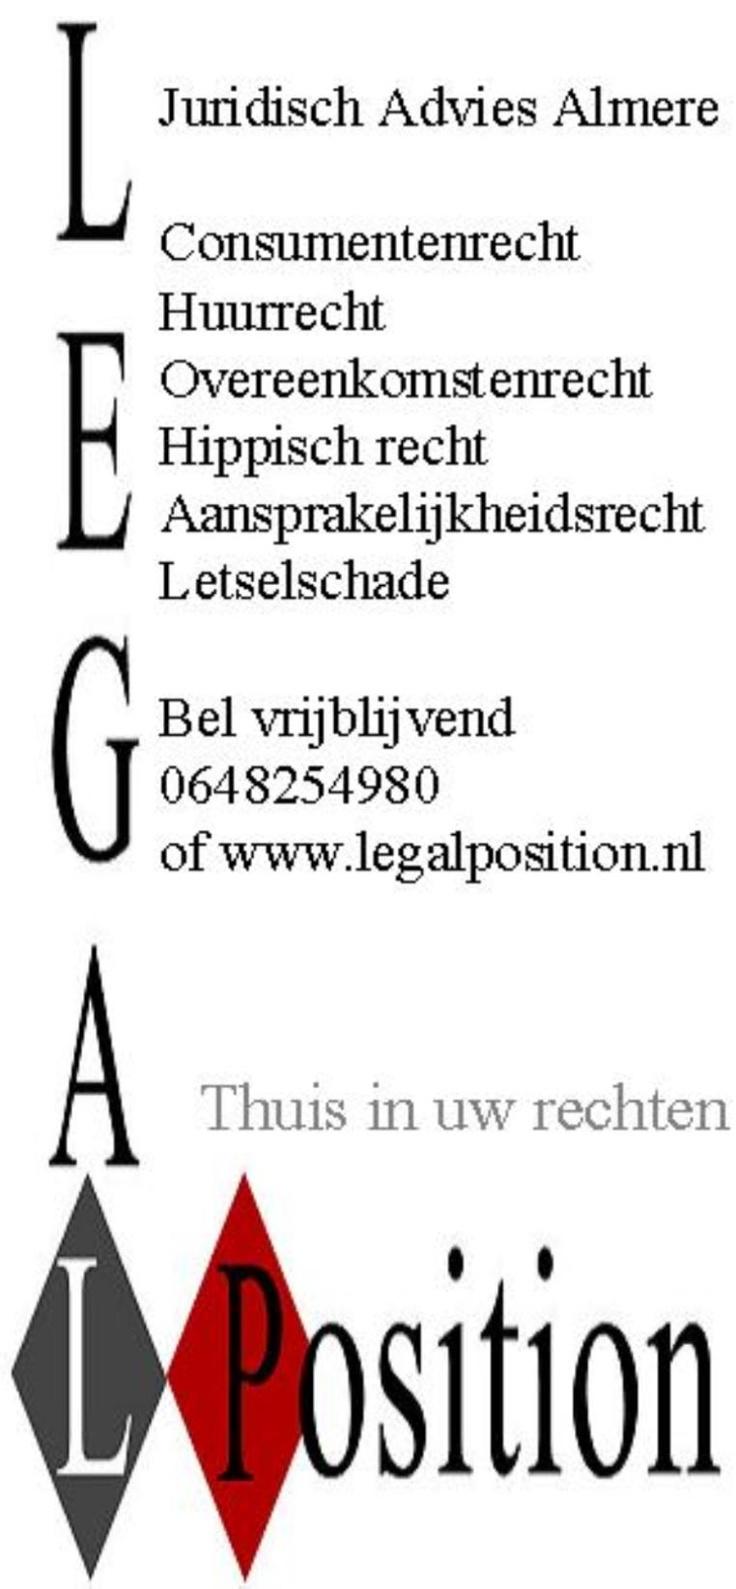 legalposition.nl